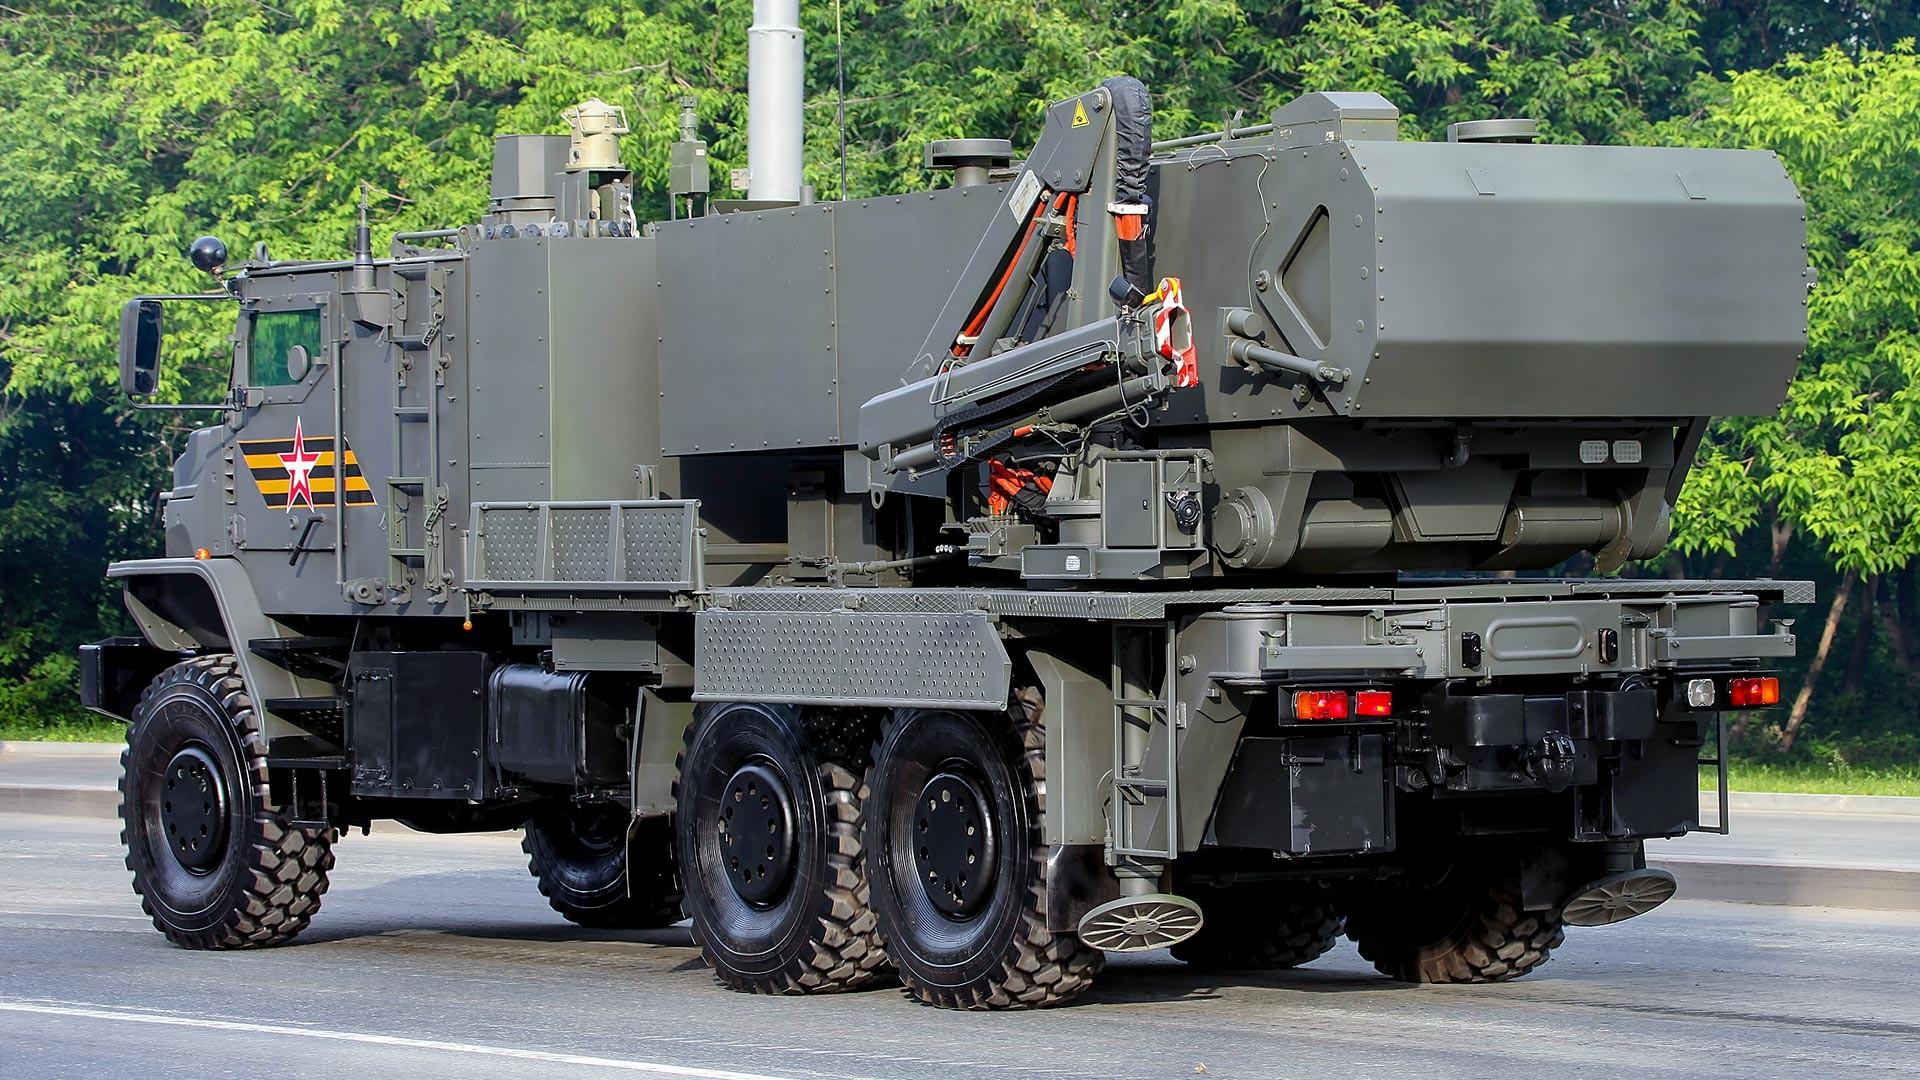 TOS-2 Tosochka